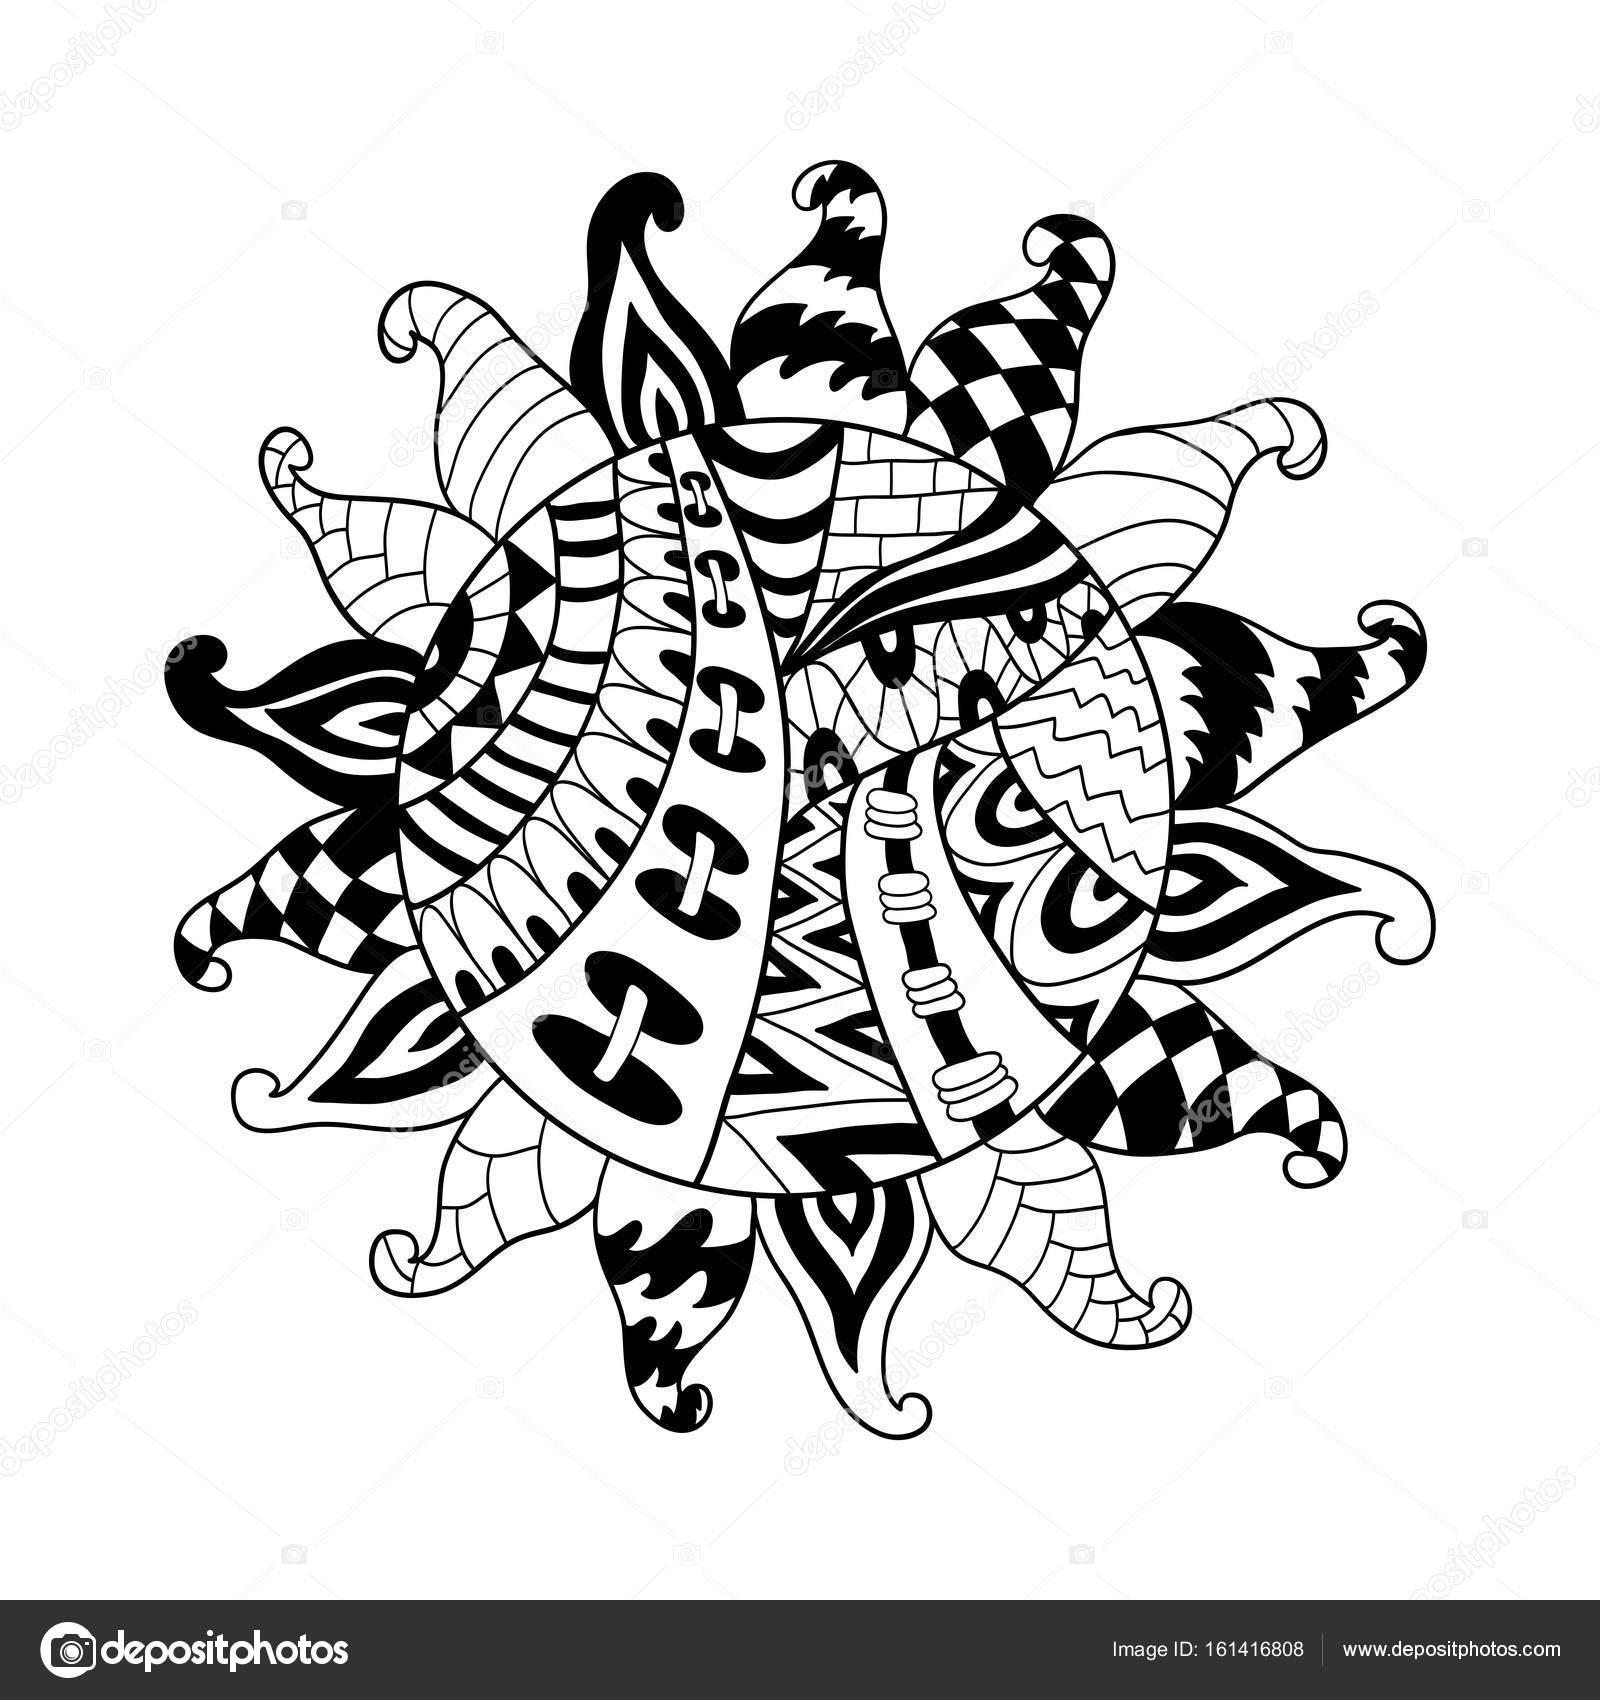 Zentangle Vektor Sonnensymbol. Tribal Sun doodle ornament ...